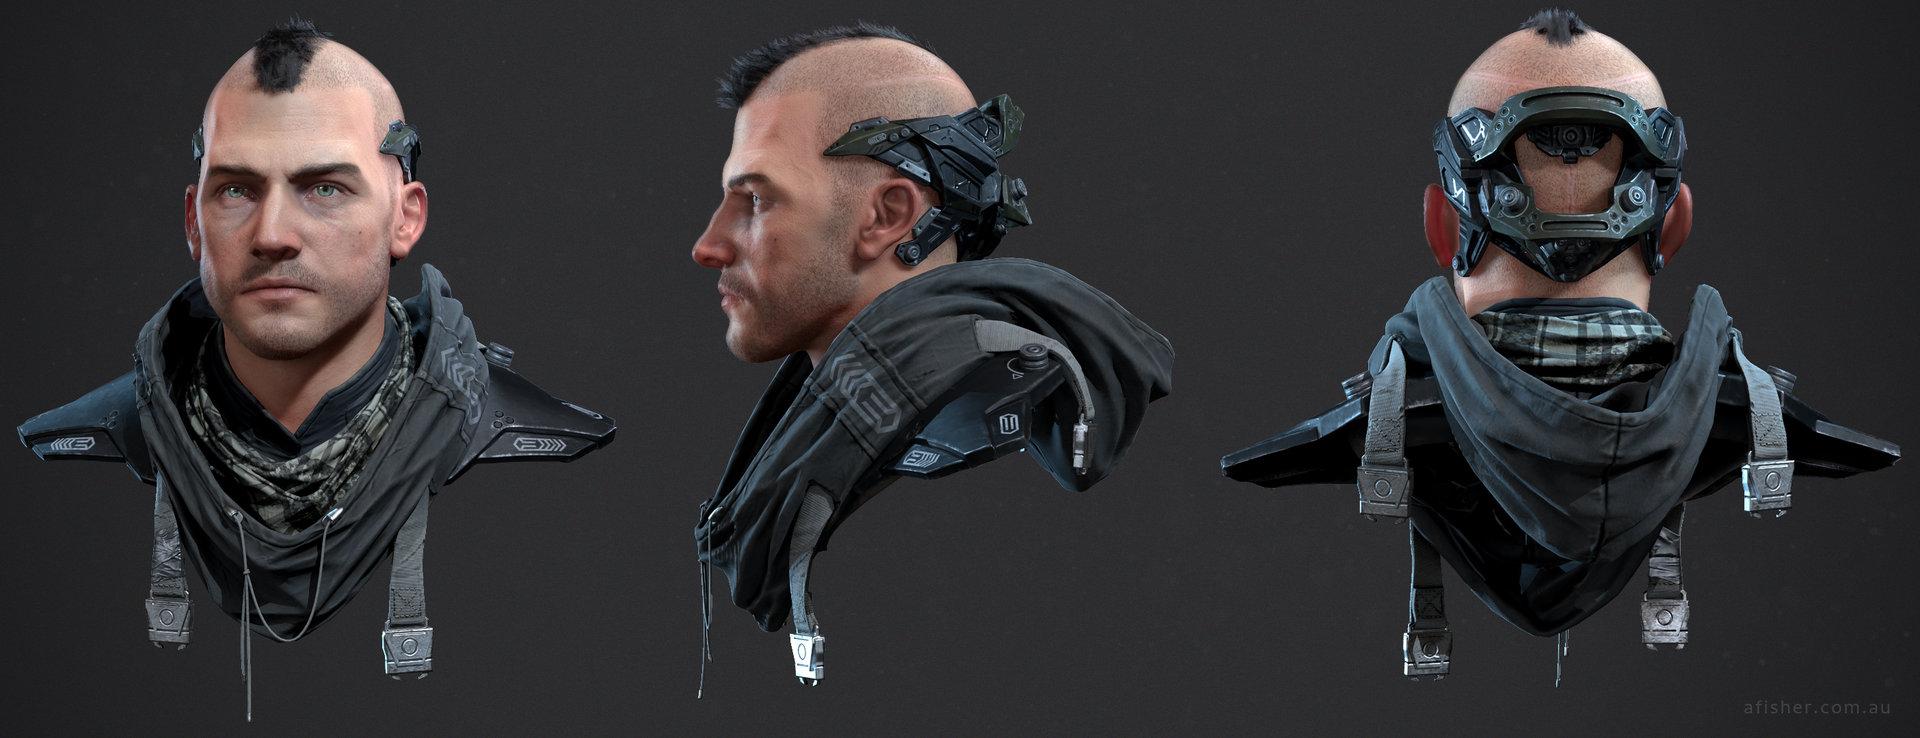 Adam fisher afisher cyberpunk 02